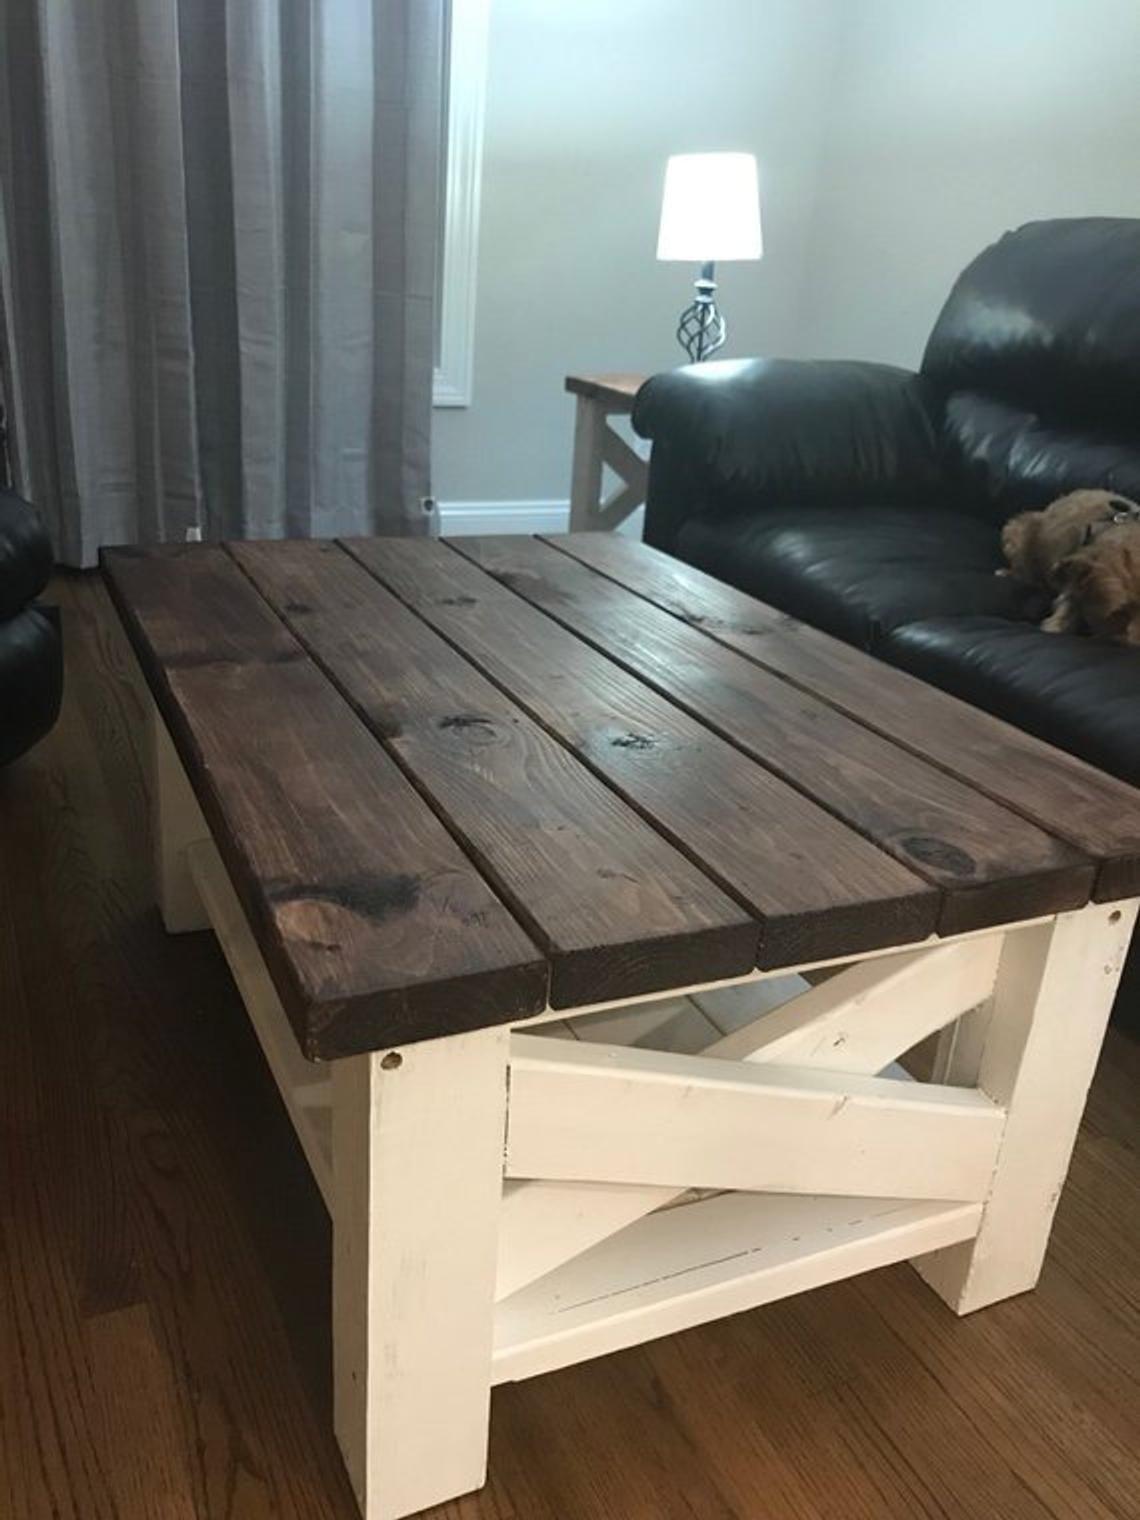 Farmhouse Coffee Table Coffee table, Coffee table